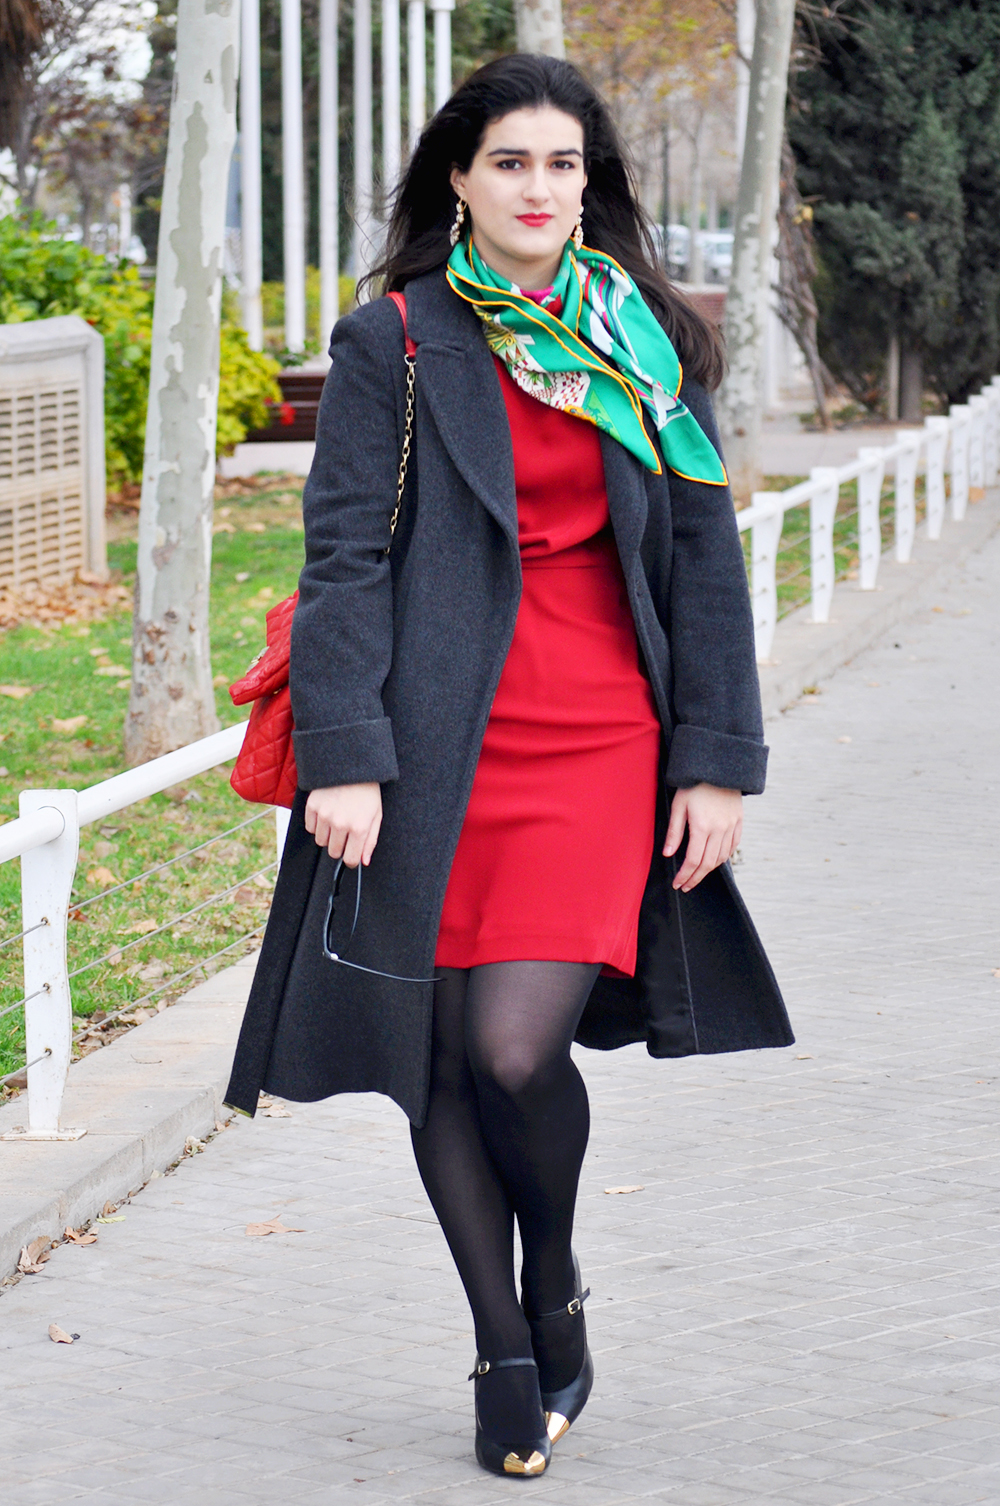 valencia spain spanish fashionista fashionblogger somethingfashion hermes carre scarf christmas holiday outfit ideas streetstyle_0068 copia